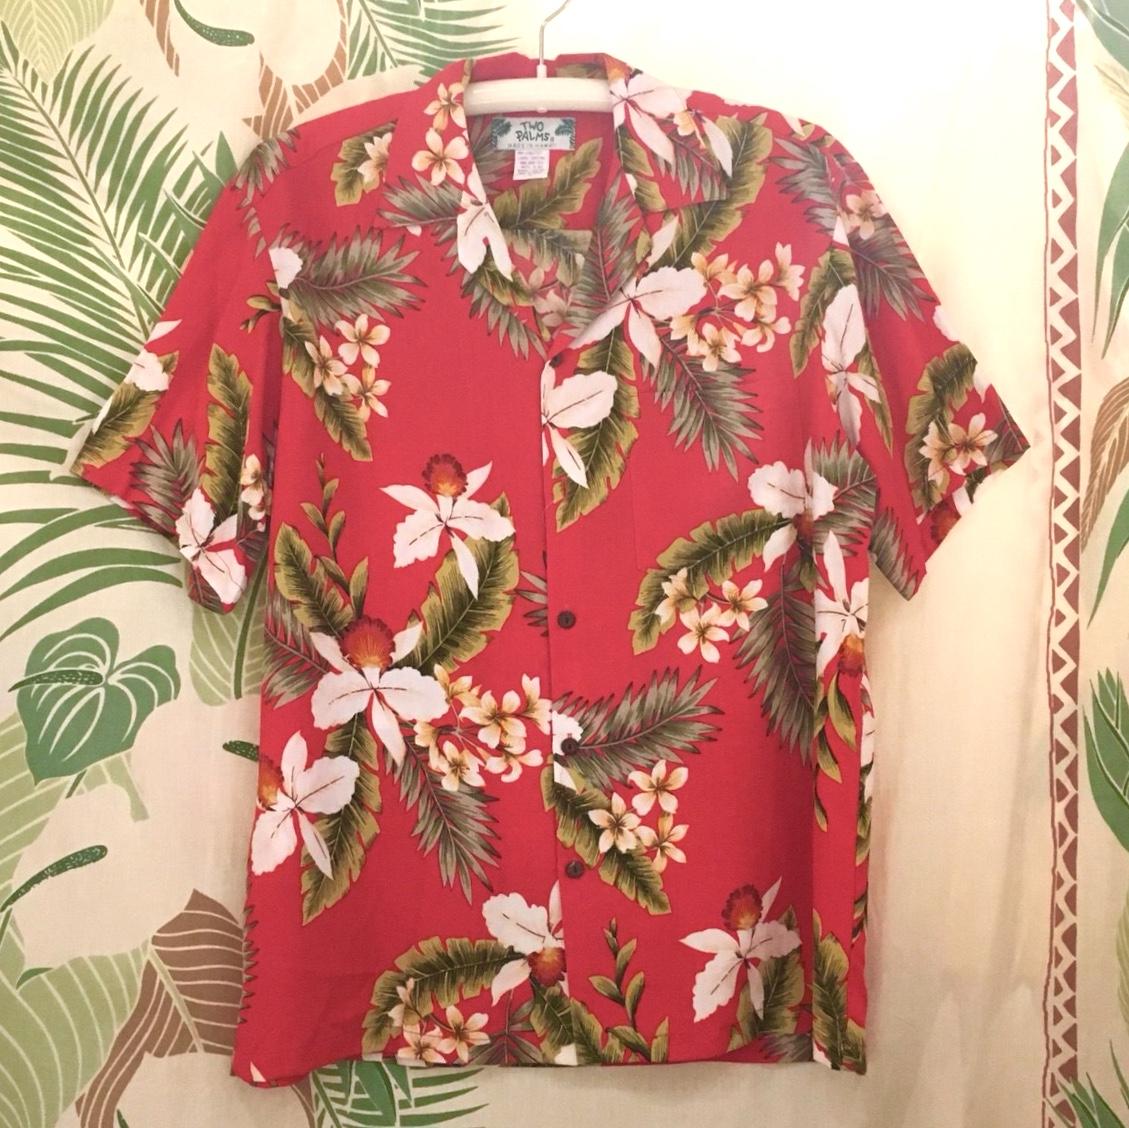 Mensアロハシャツ /オーキッドRED/Mサイズ